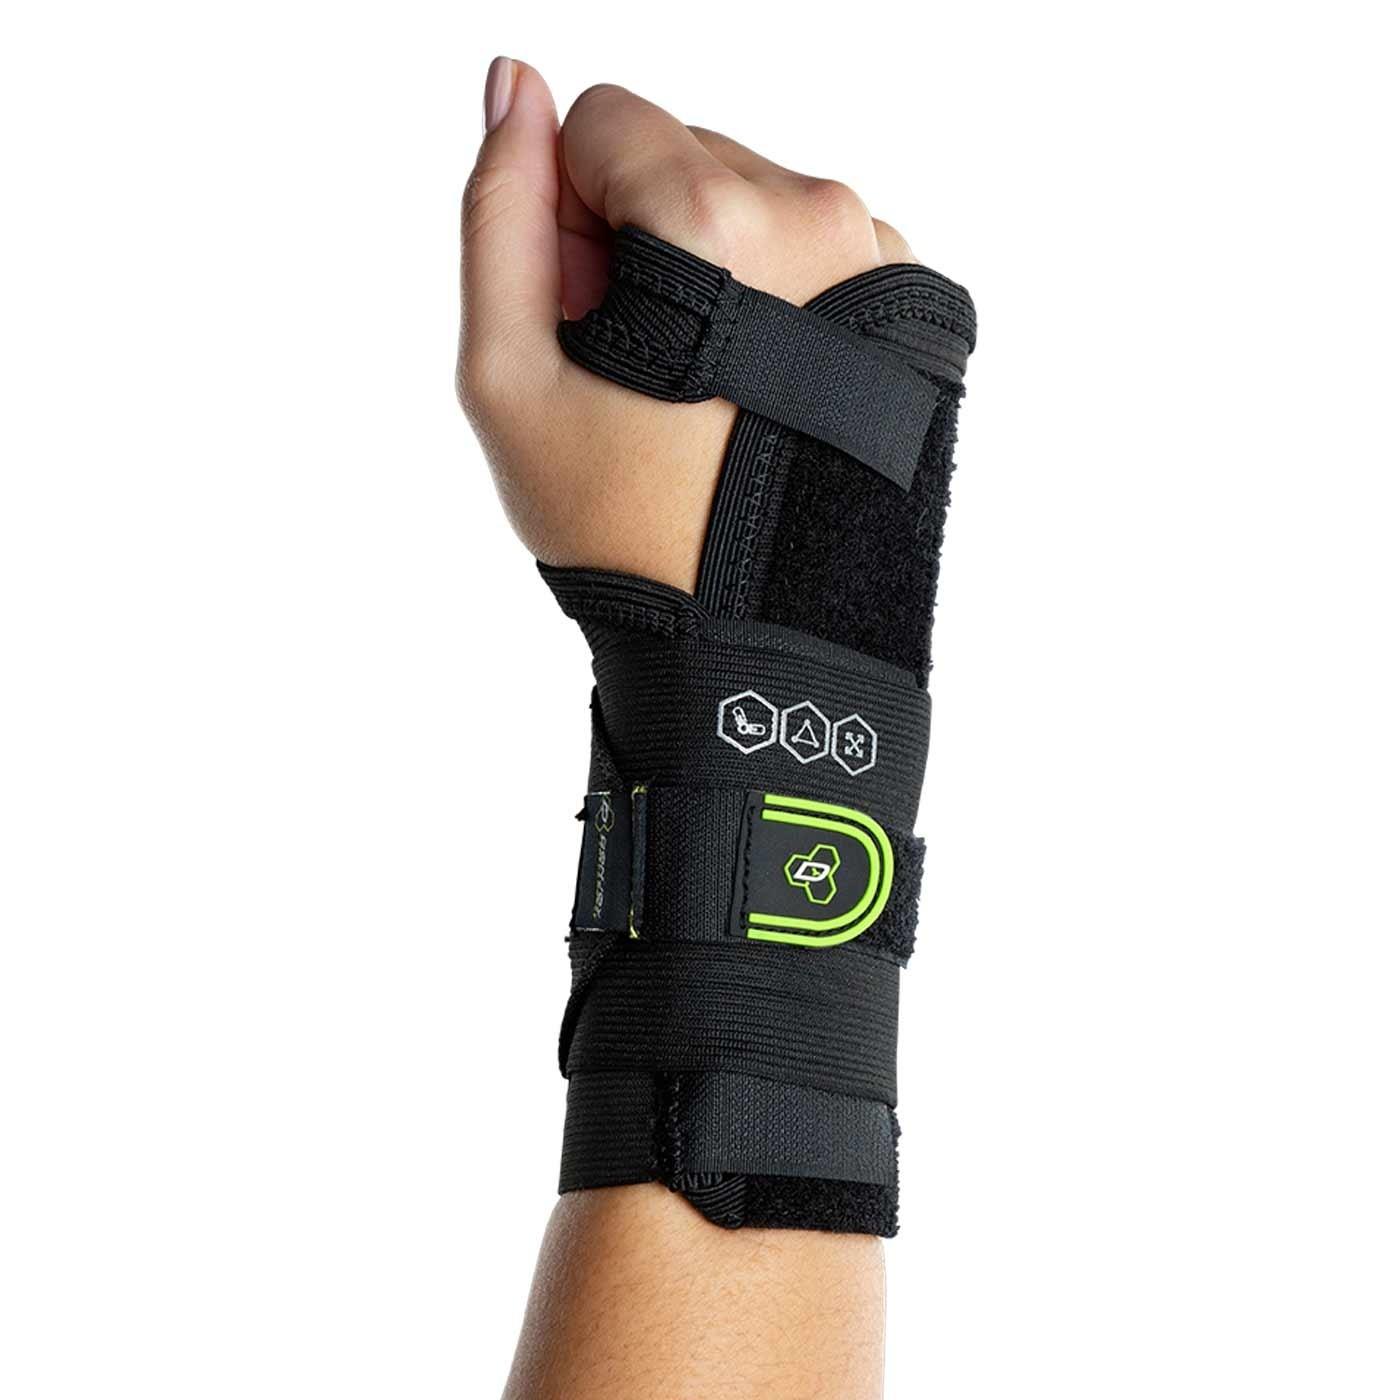 DonJoy Performance Bionic Elastic Wrist Brace